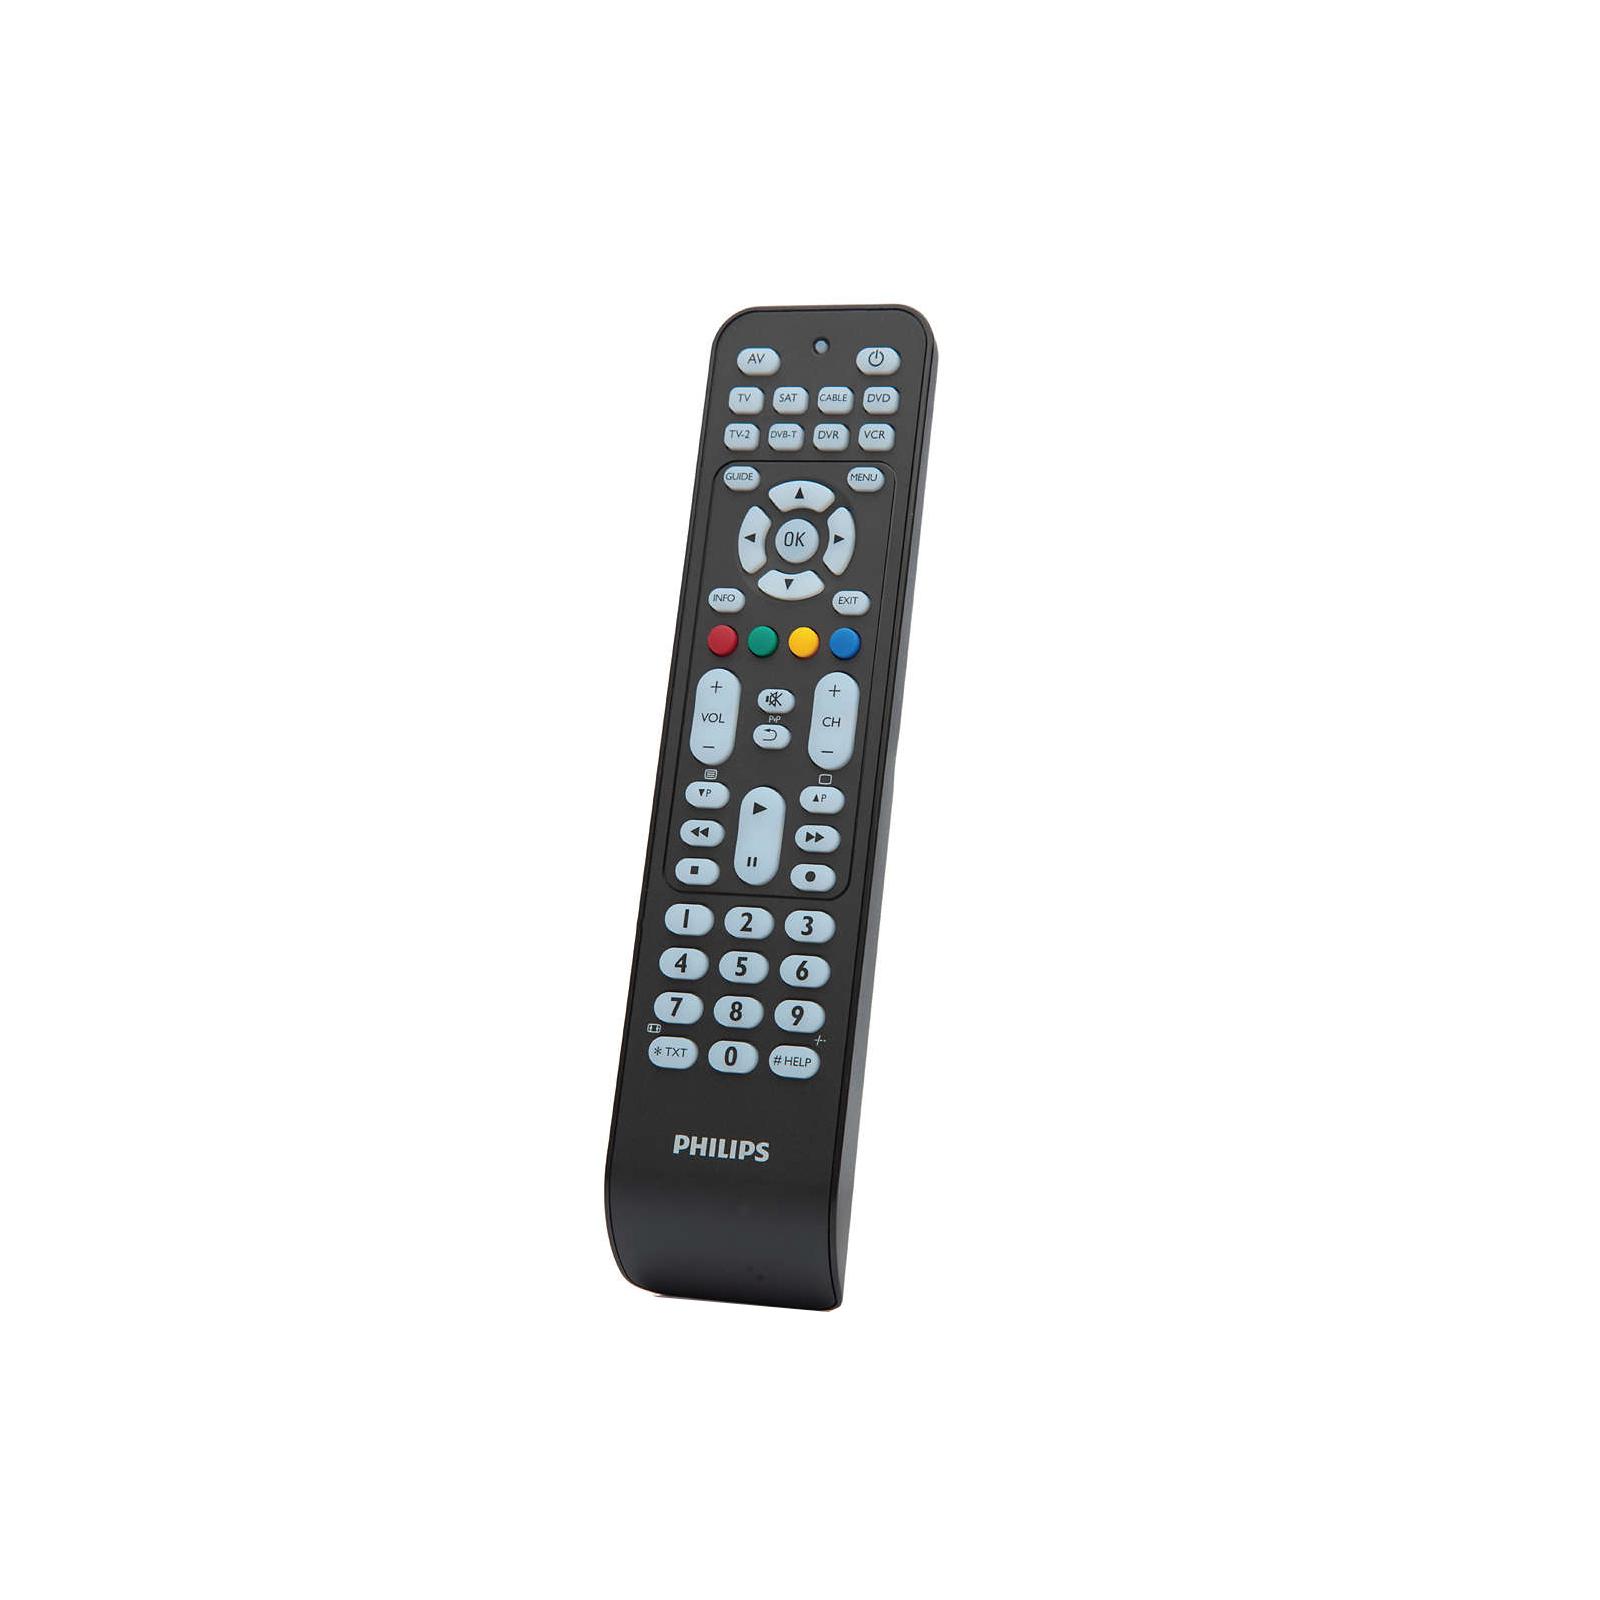 Пульт ДУ для телевизора PHILIPS SRP2008B (SRP2008B/86) изображение 3